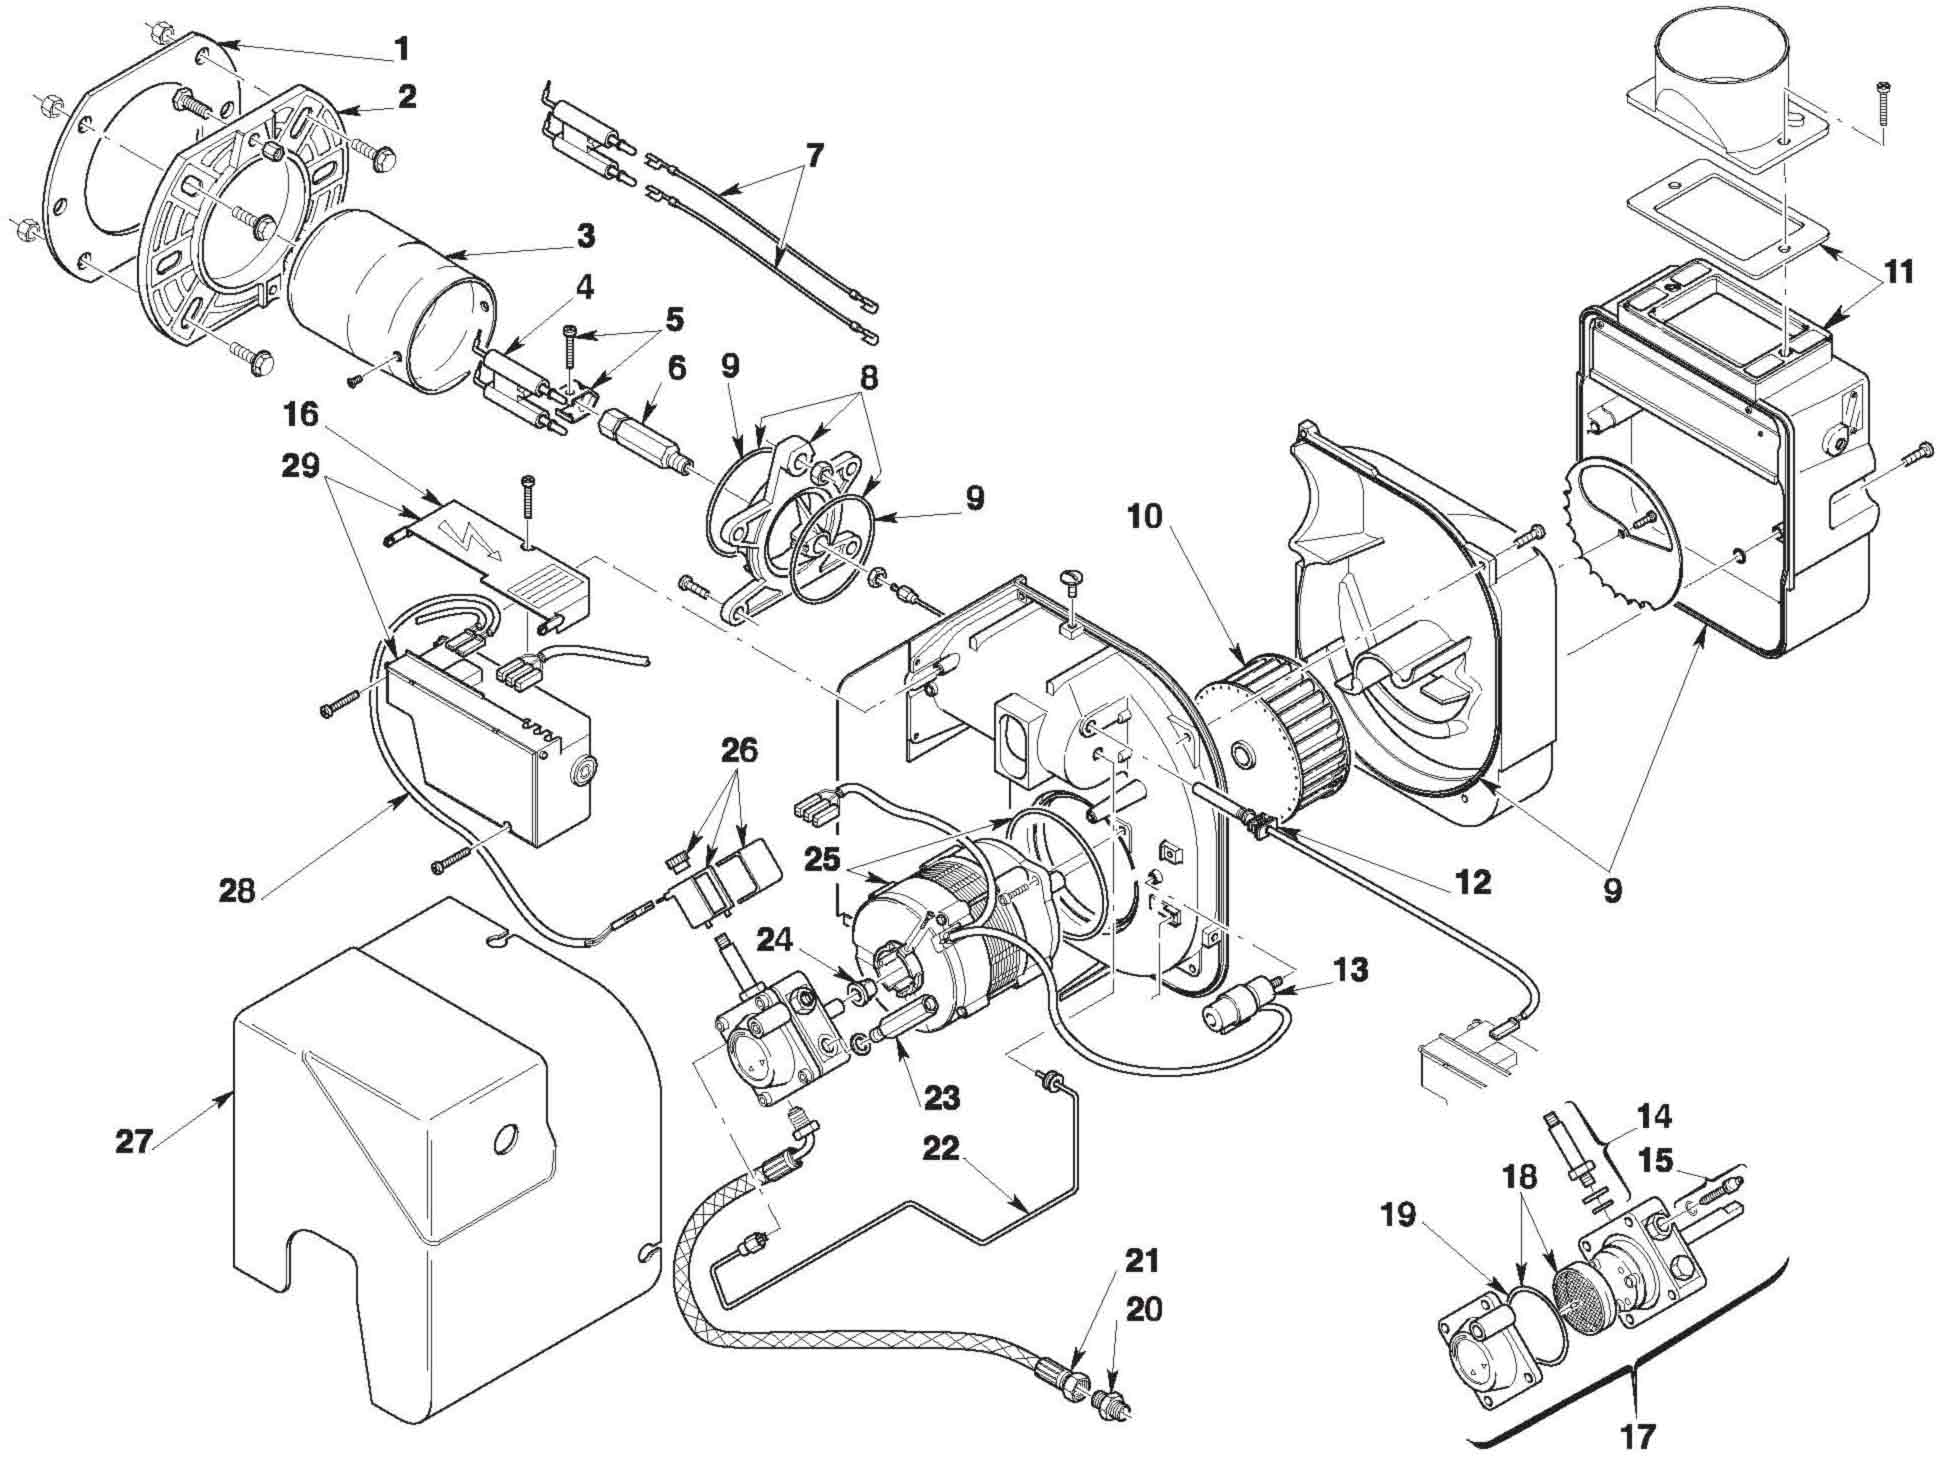 12 Volt Wiring Diagram For Beckett Burner